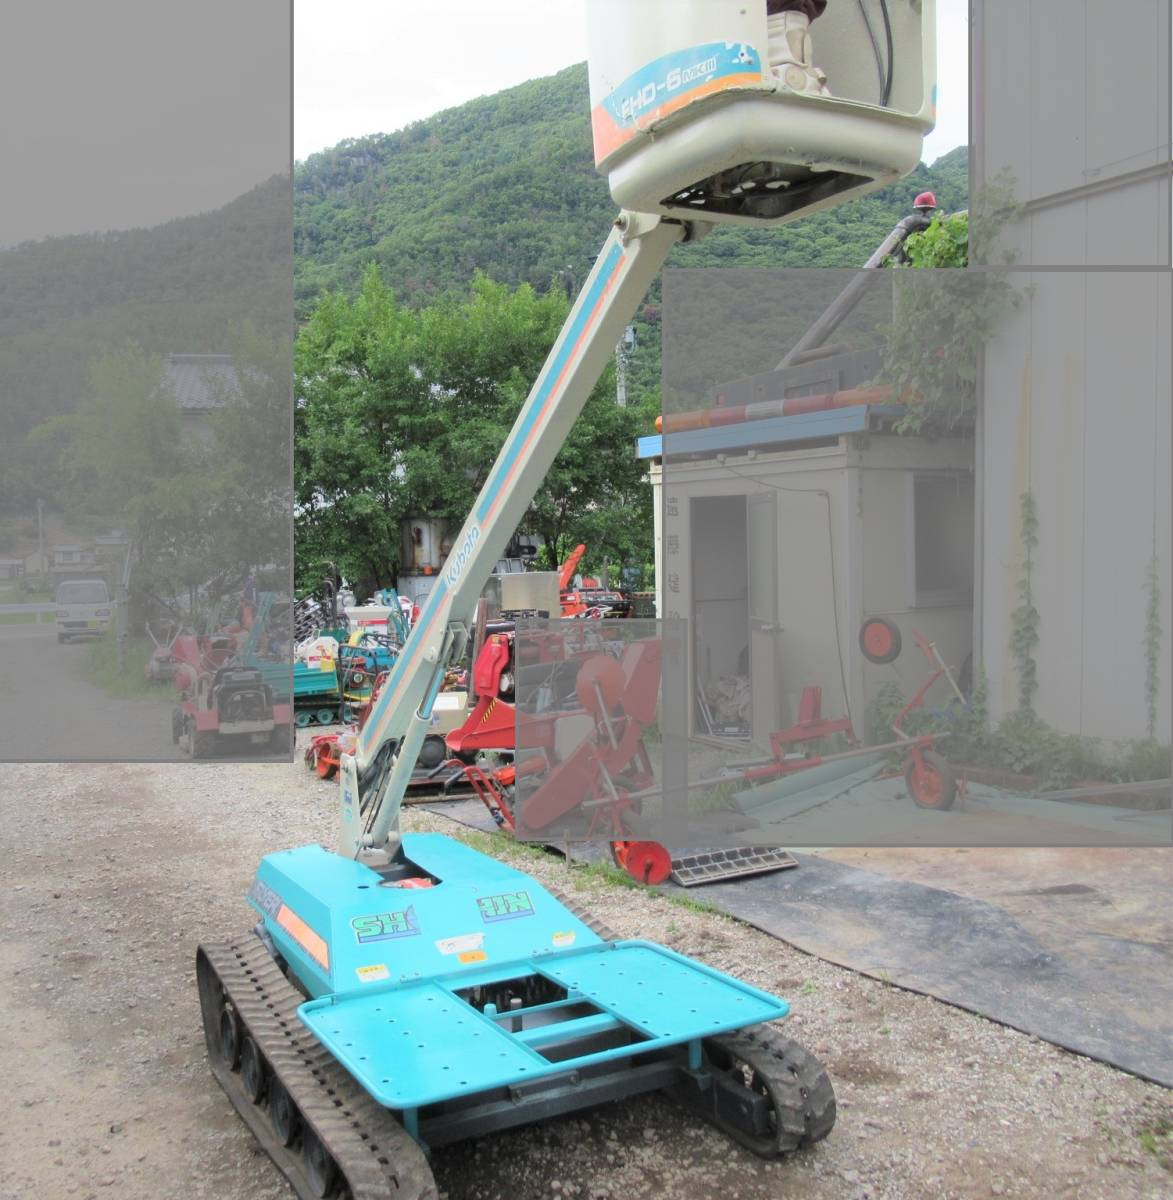 クボタ 高所作業車 FHD-6 MK‐Ⅲ 実働品 長野市_画像9